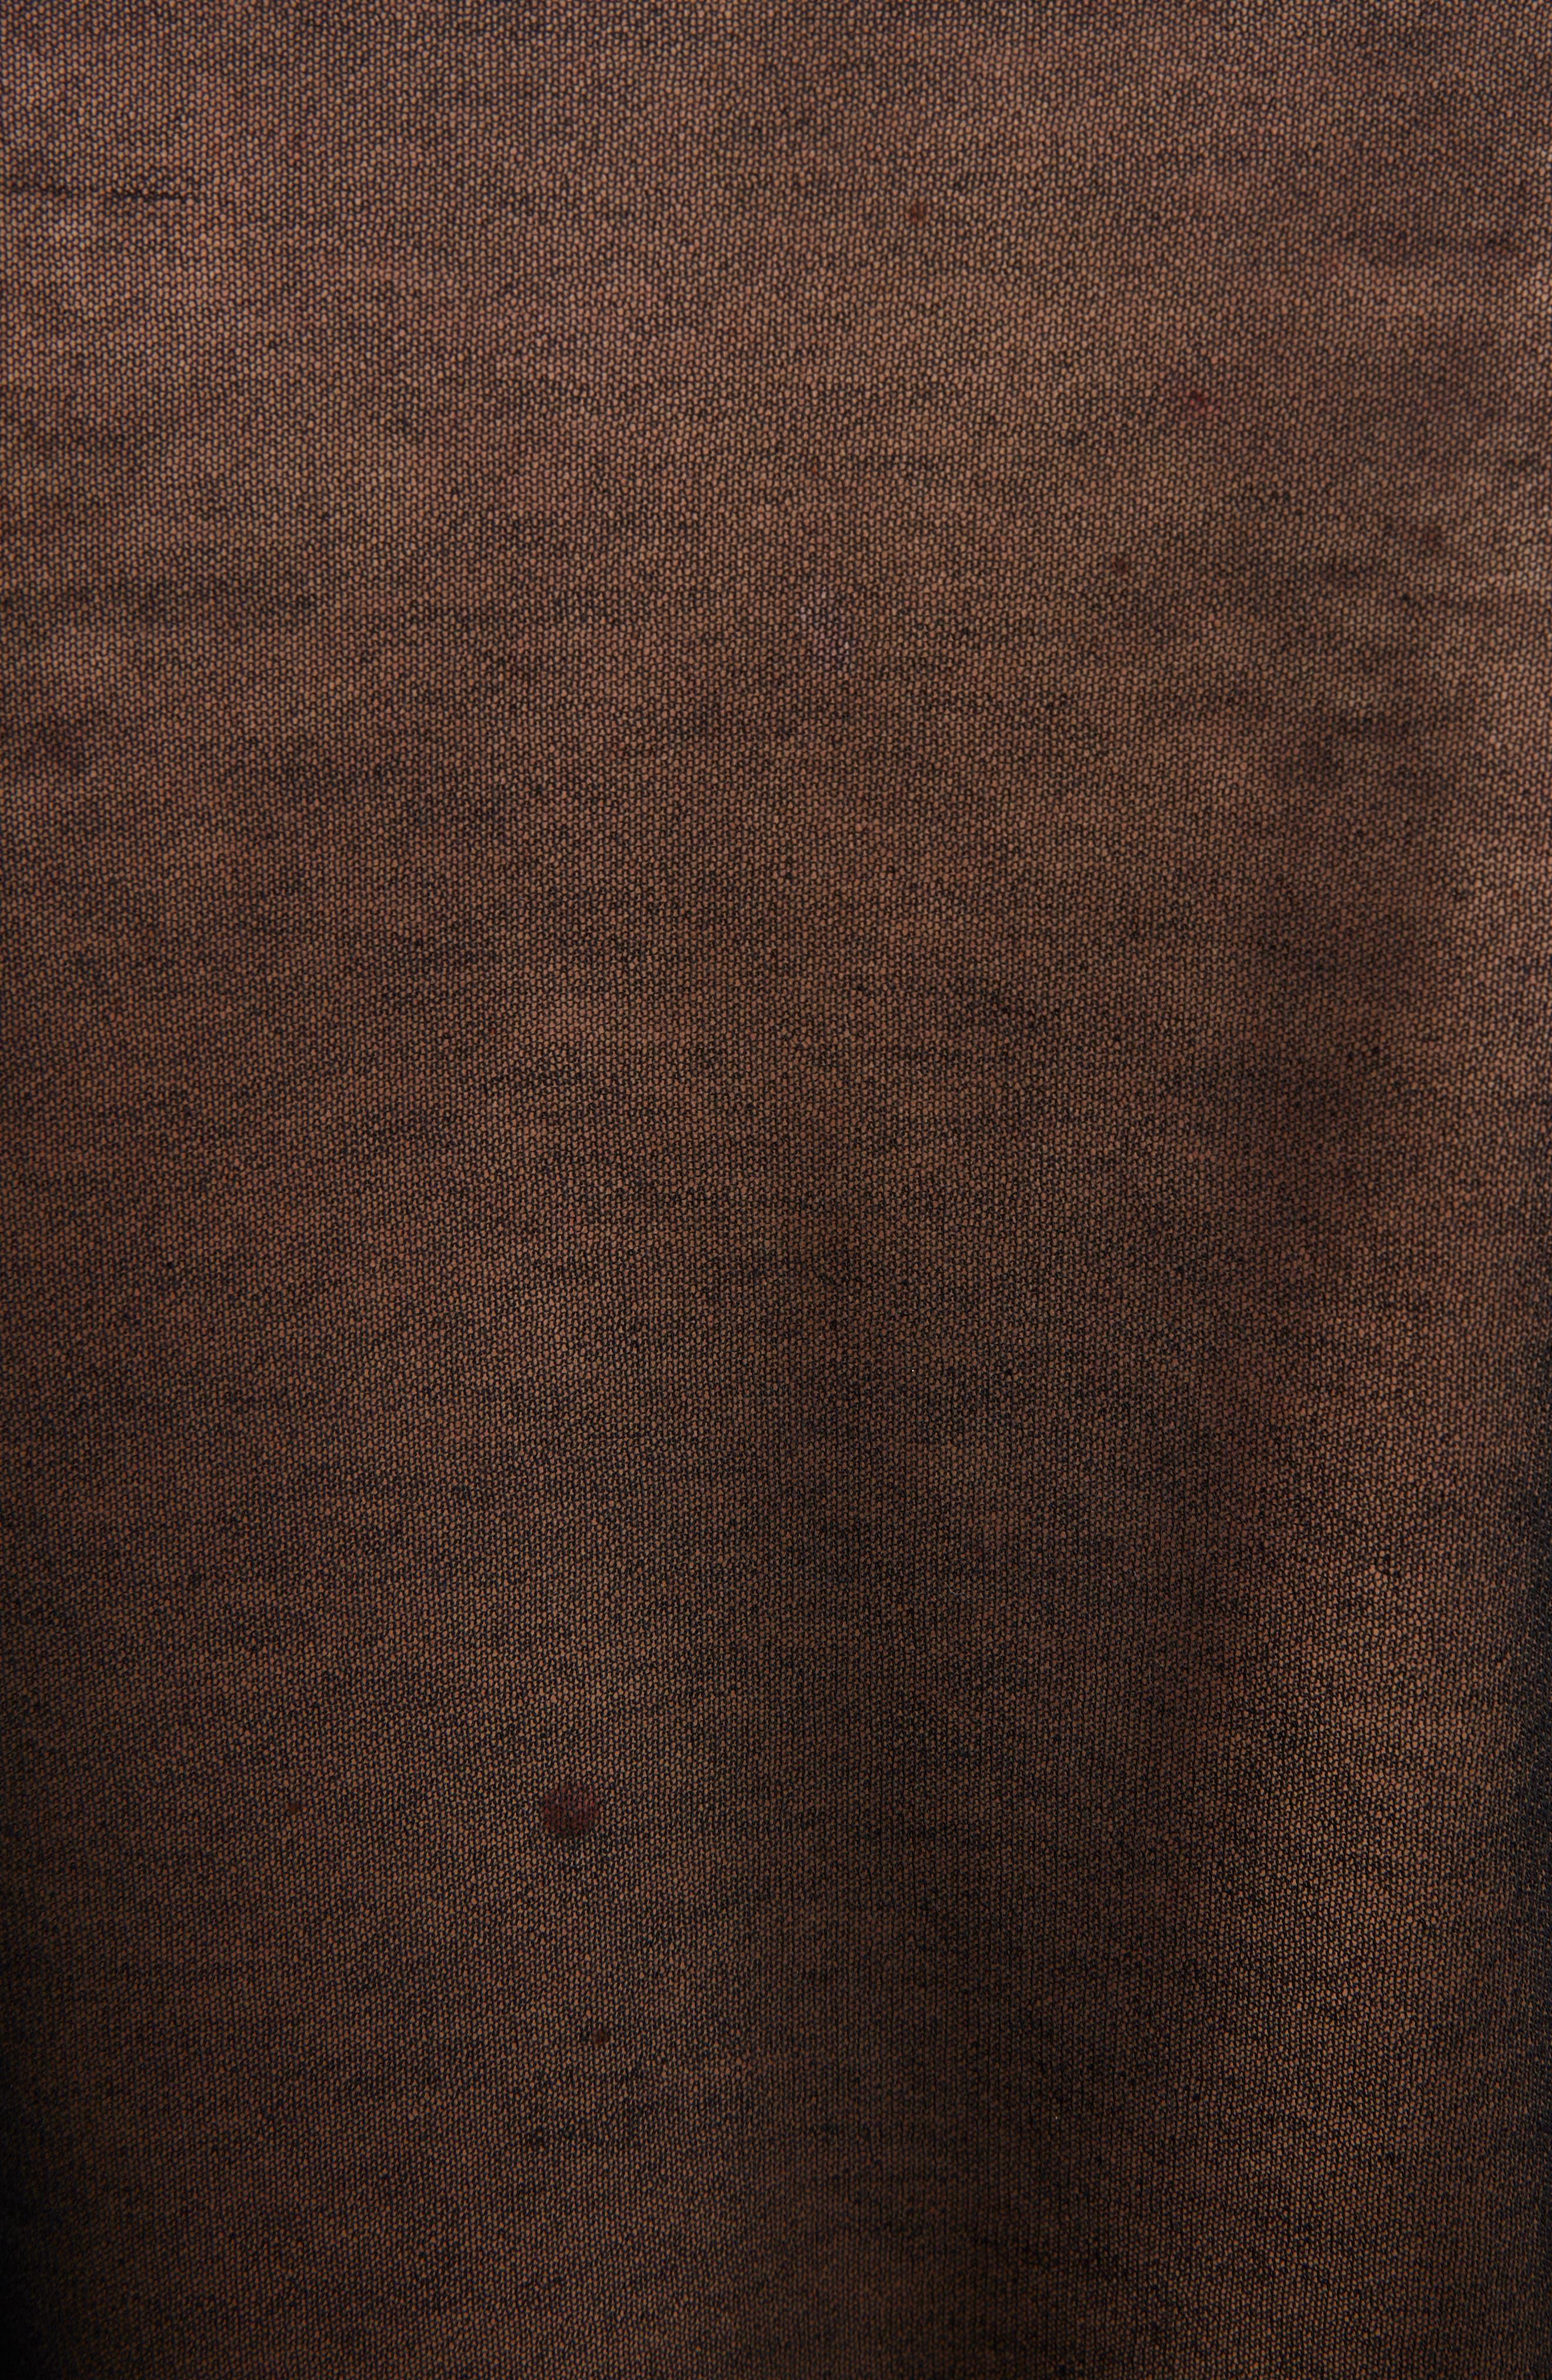 Sheer Cotton Knit Top,                             Alternate thumbnail 5, color,                             001